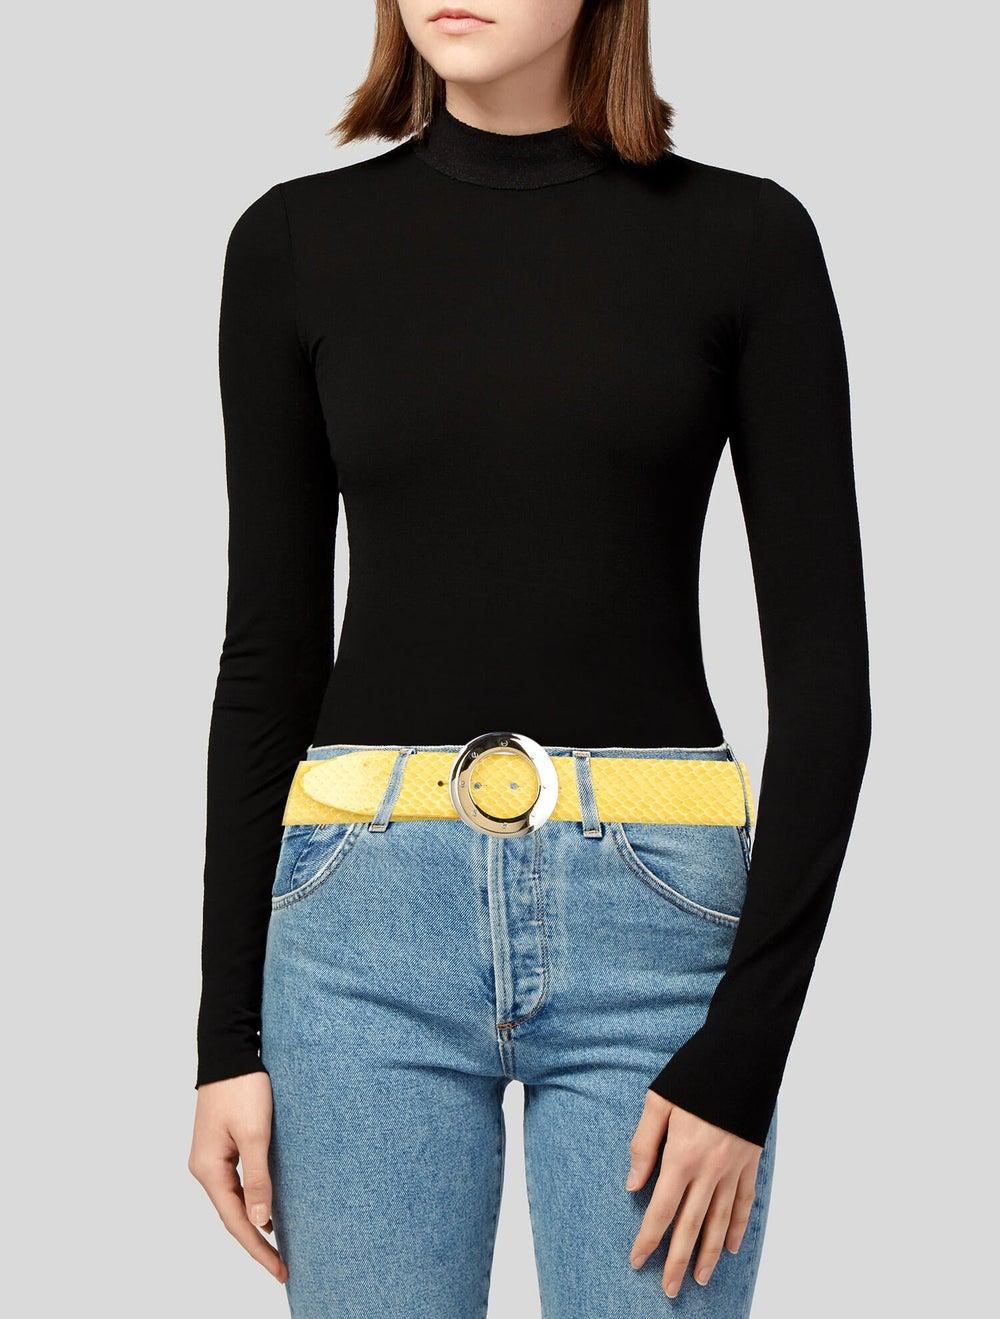 Dolce & Gabbana Python Buckle Belt Yellow - image 2